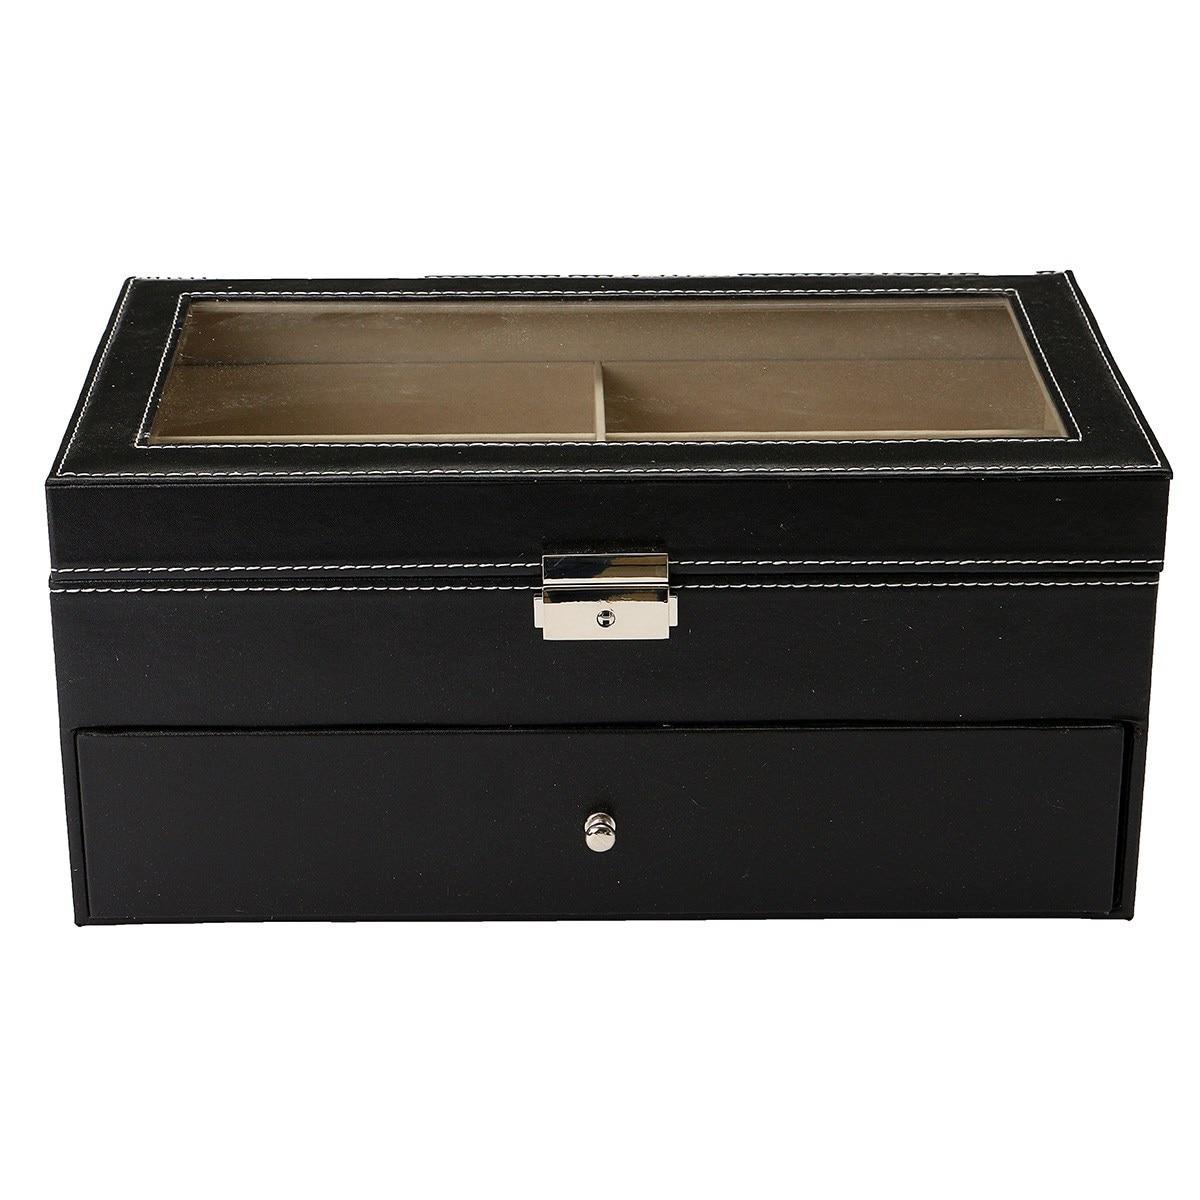 Decorative Display Cases Online Get Cheap Decorative Wooden Box Aliexpresscom Alibaba Group